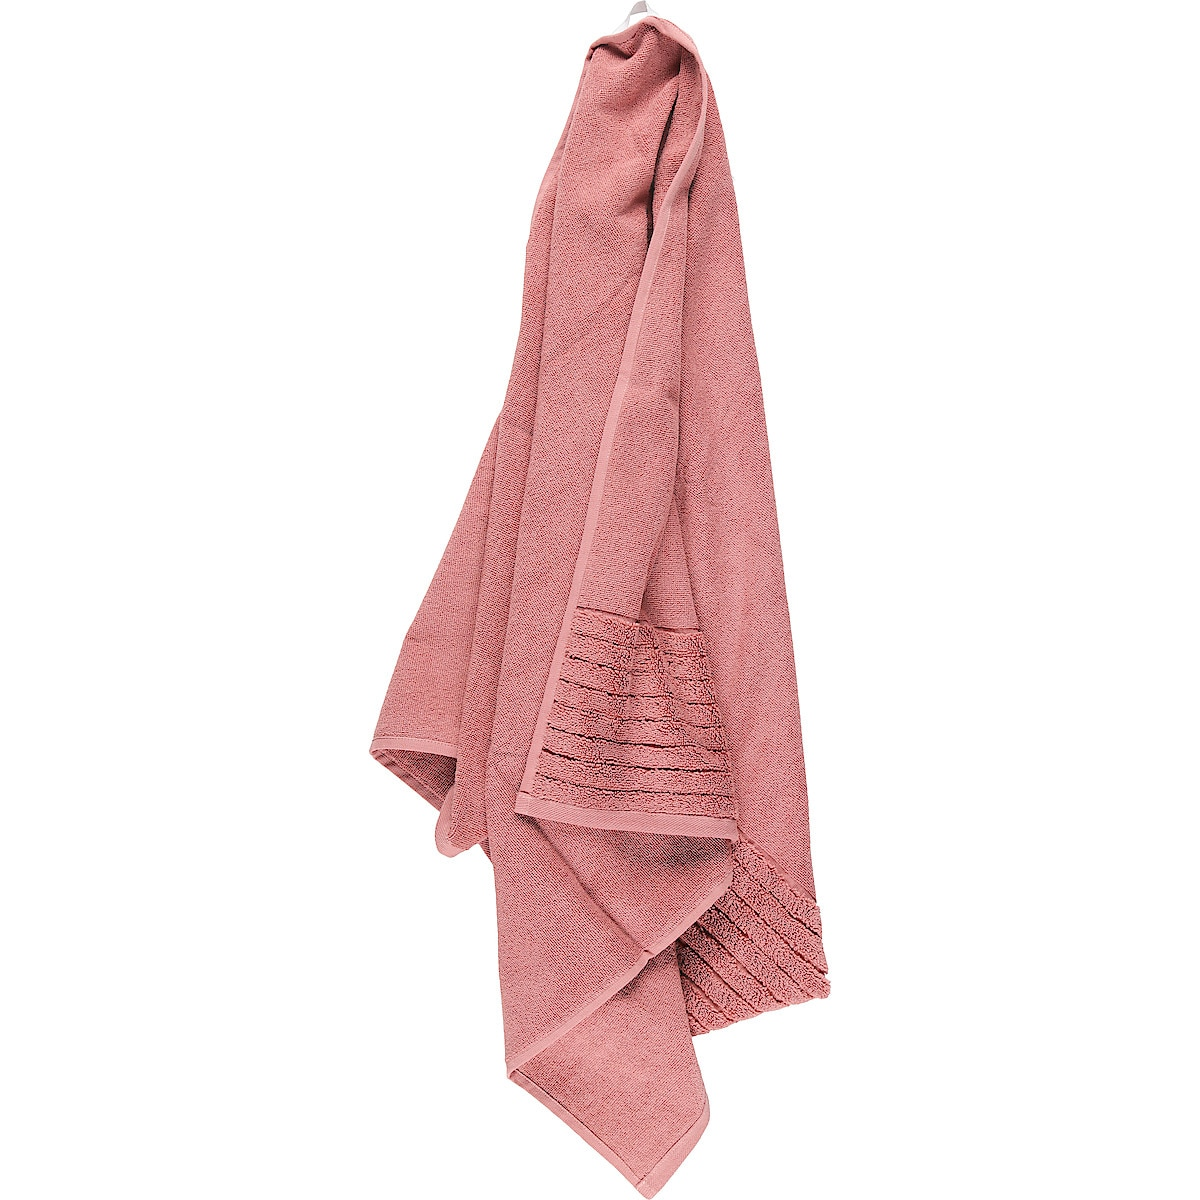 Pink Bath Towel, 70 x 140 cm